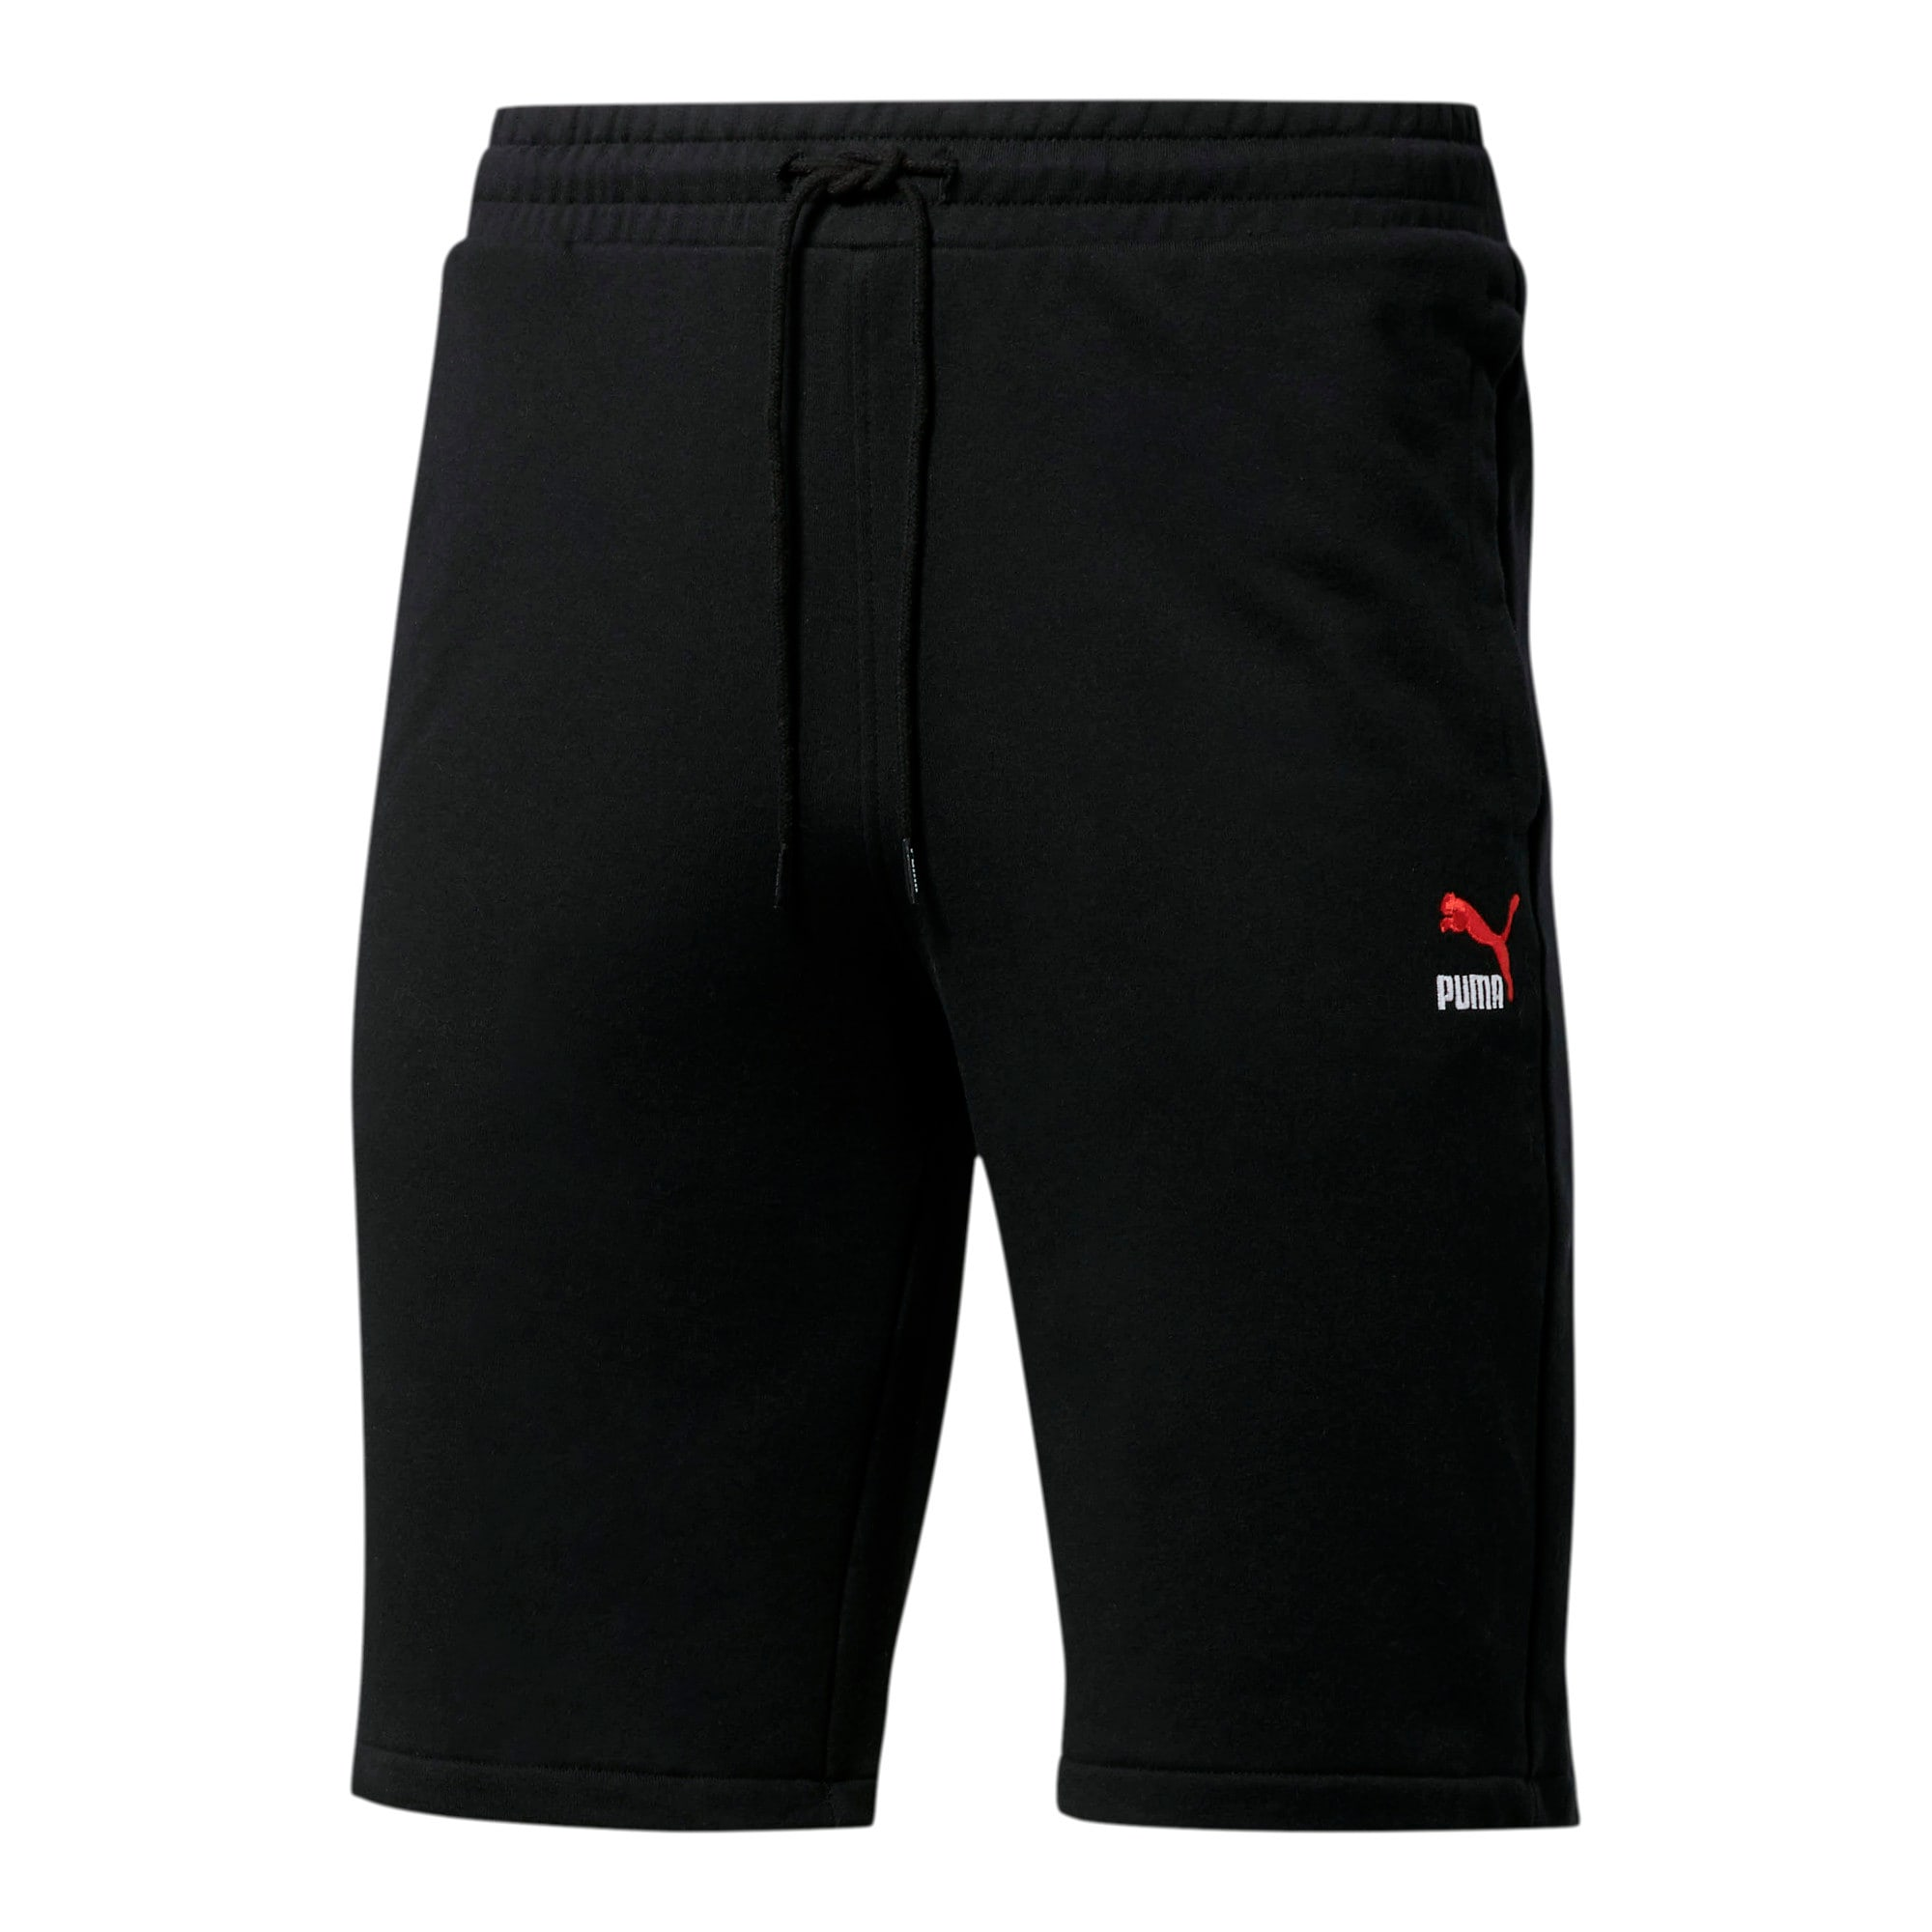 Thumbnail 1 of Classics Men's Emblem Shorts, Cotton Black, medium